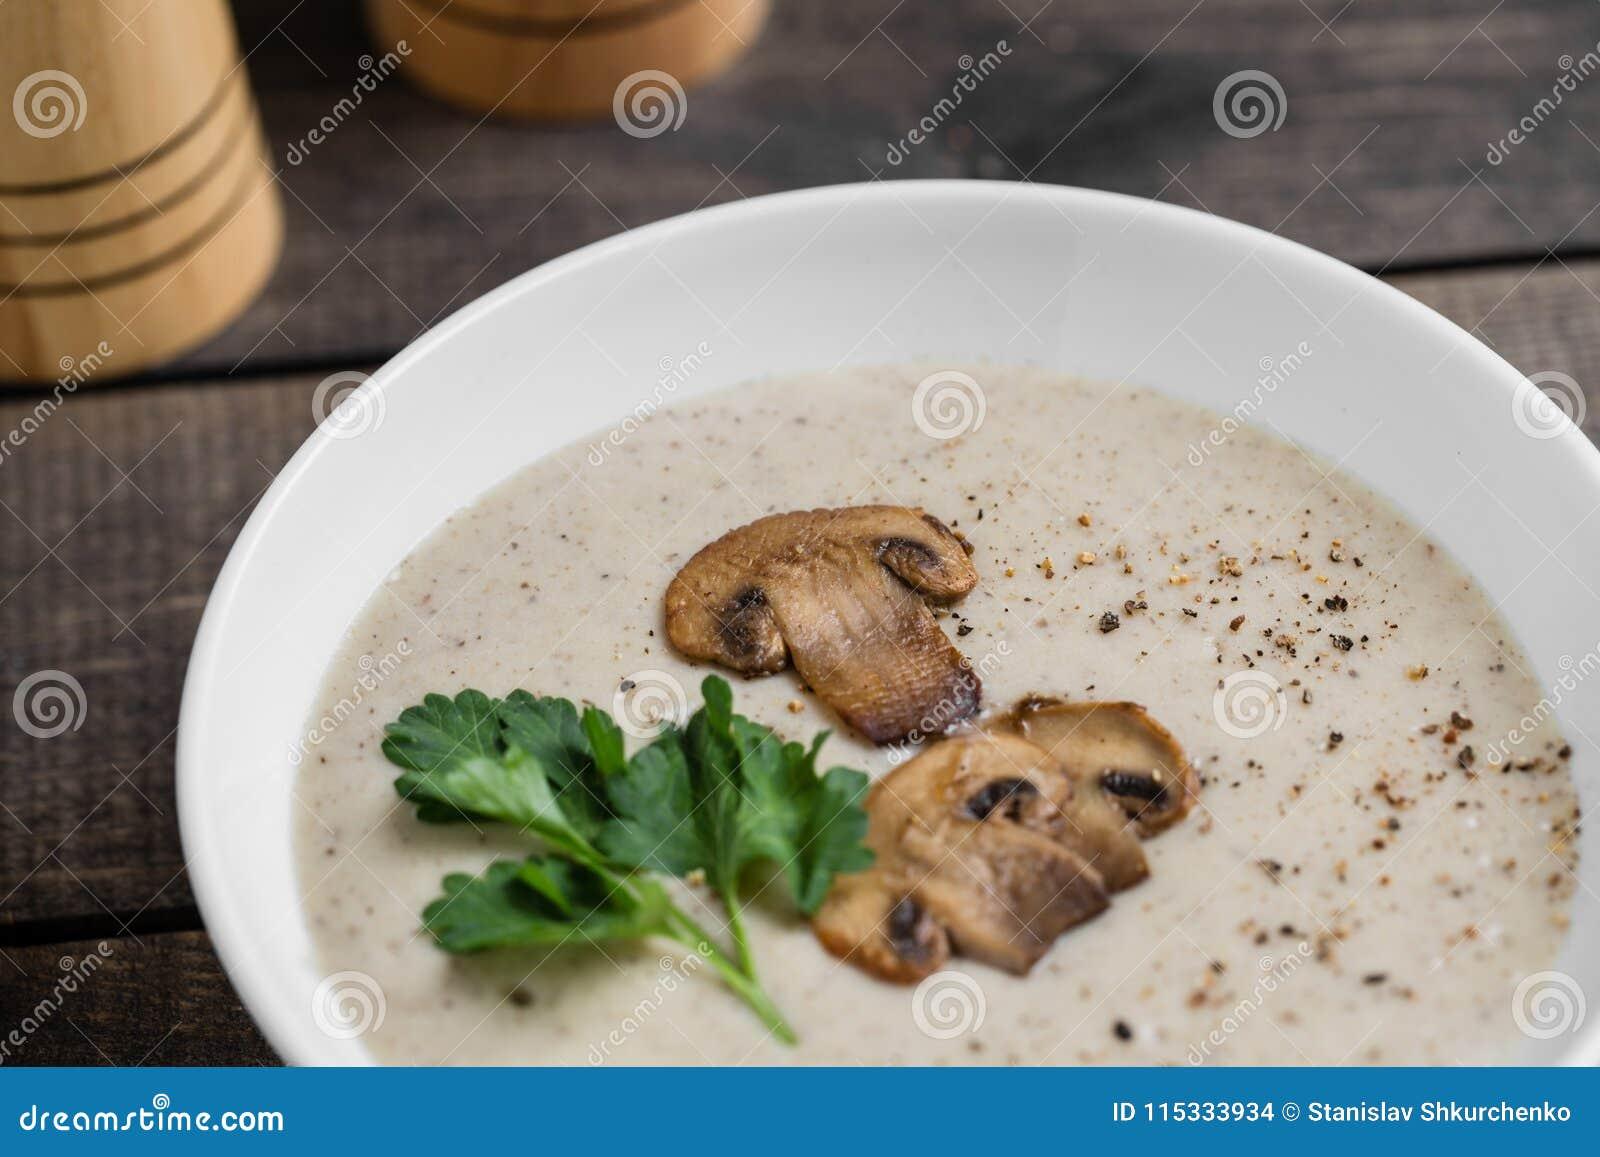 How to salt white mushrooms